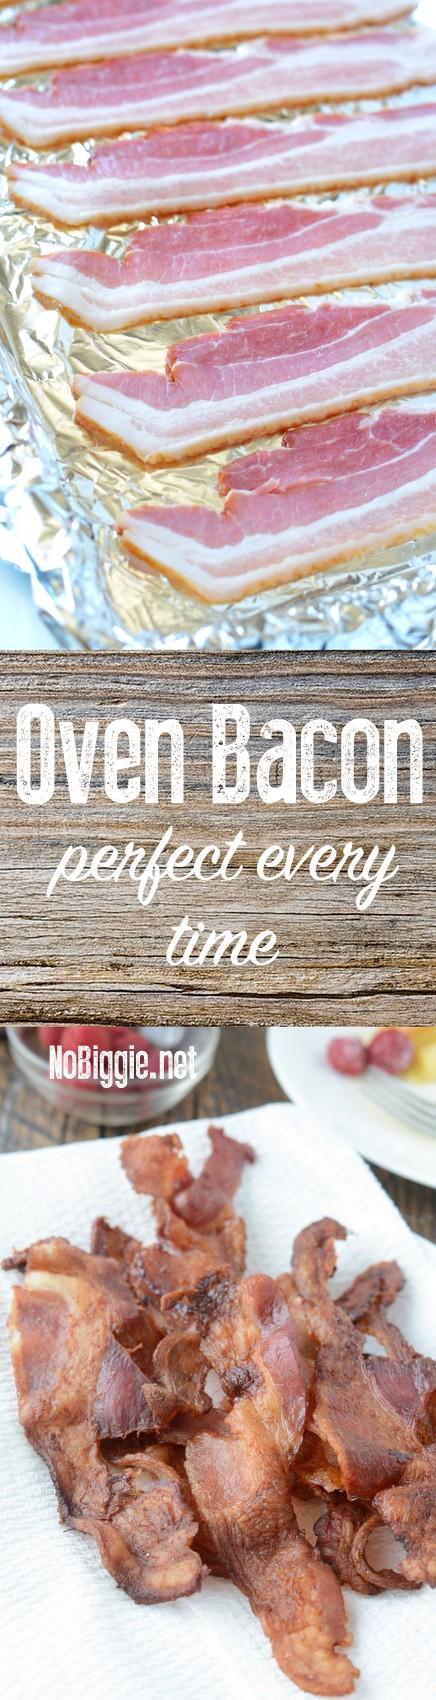 http://www.nobiggie.net/wp-content/uploads/2016/05/Oven-Bacon.jpg